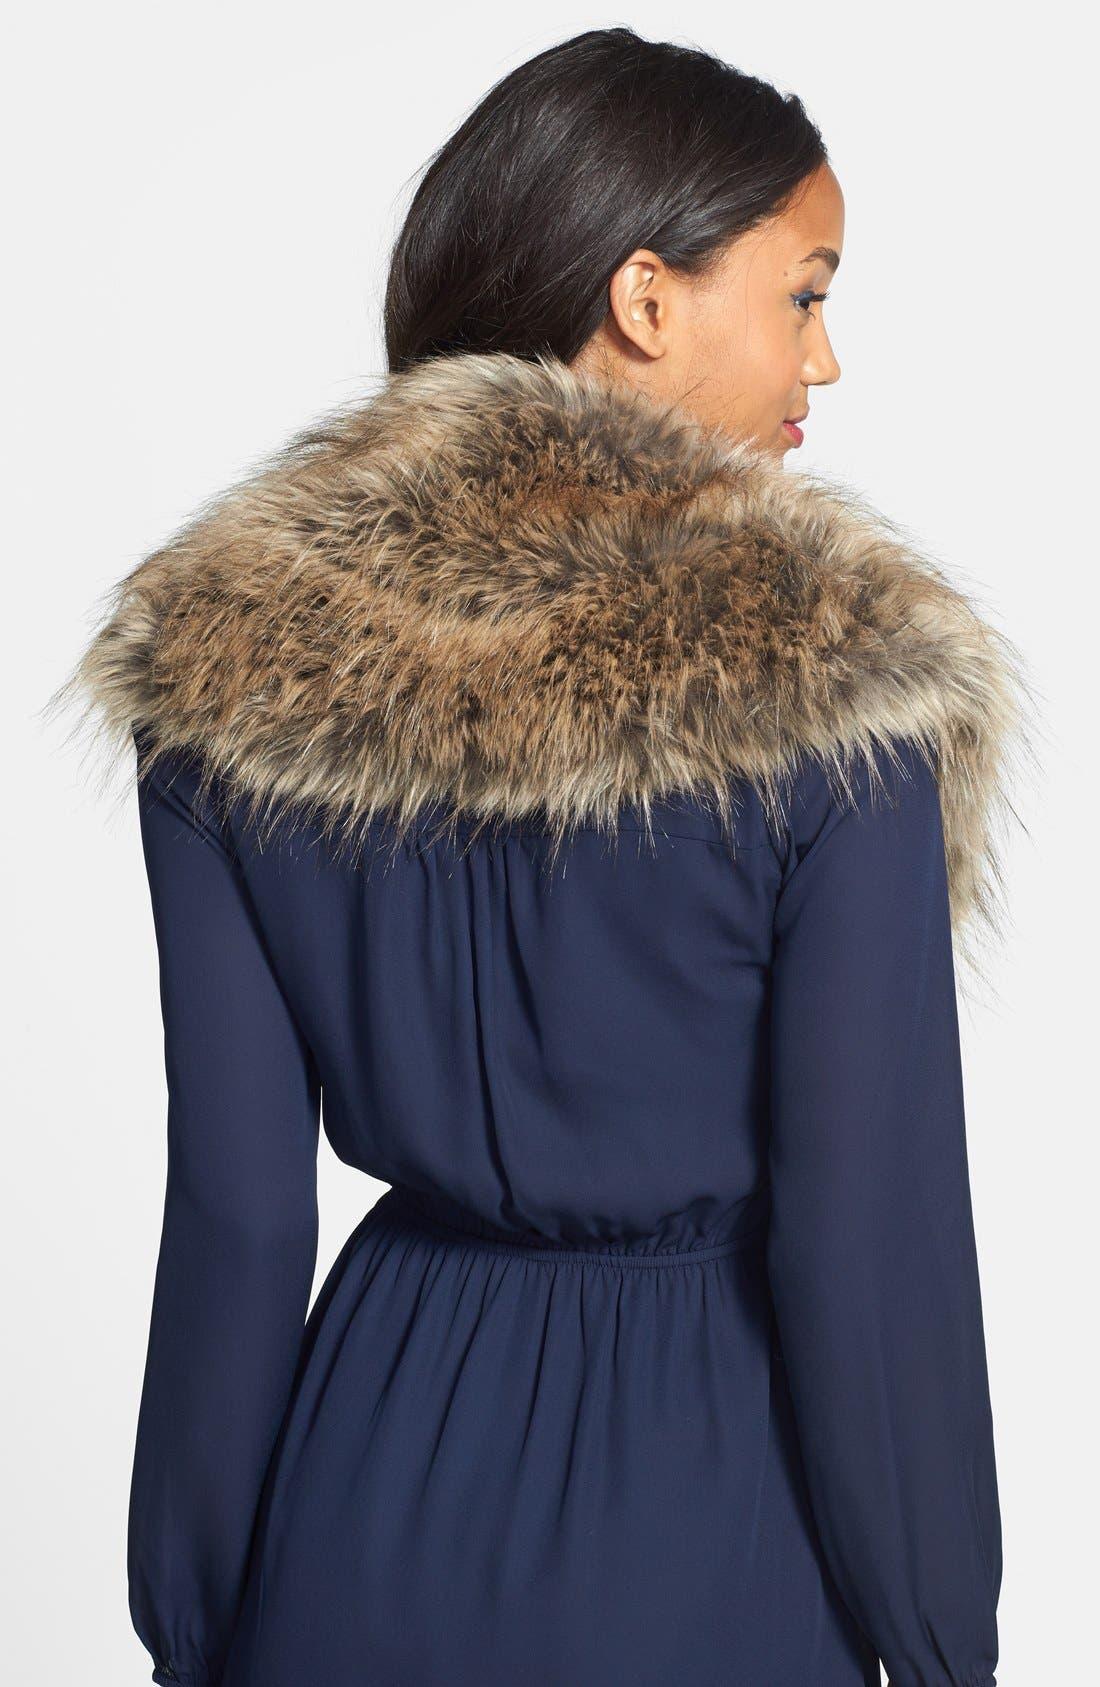 Oversized Faux Fur Collar,                             Alternate thumbnail 3, color,                             250